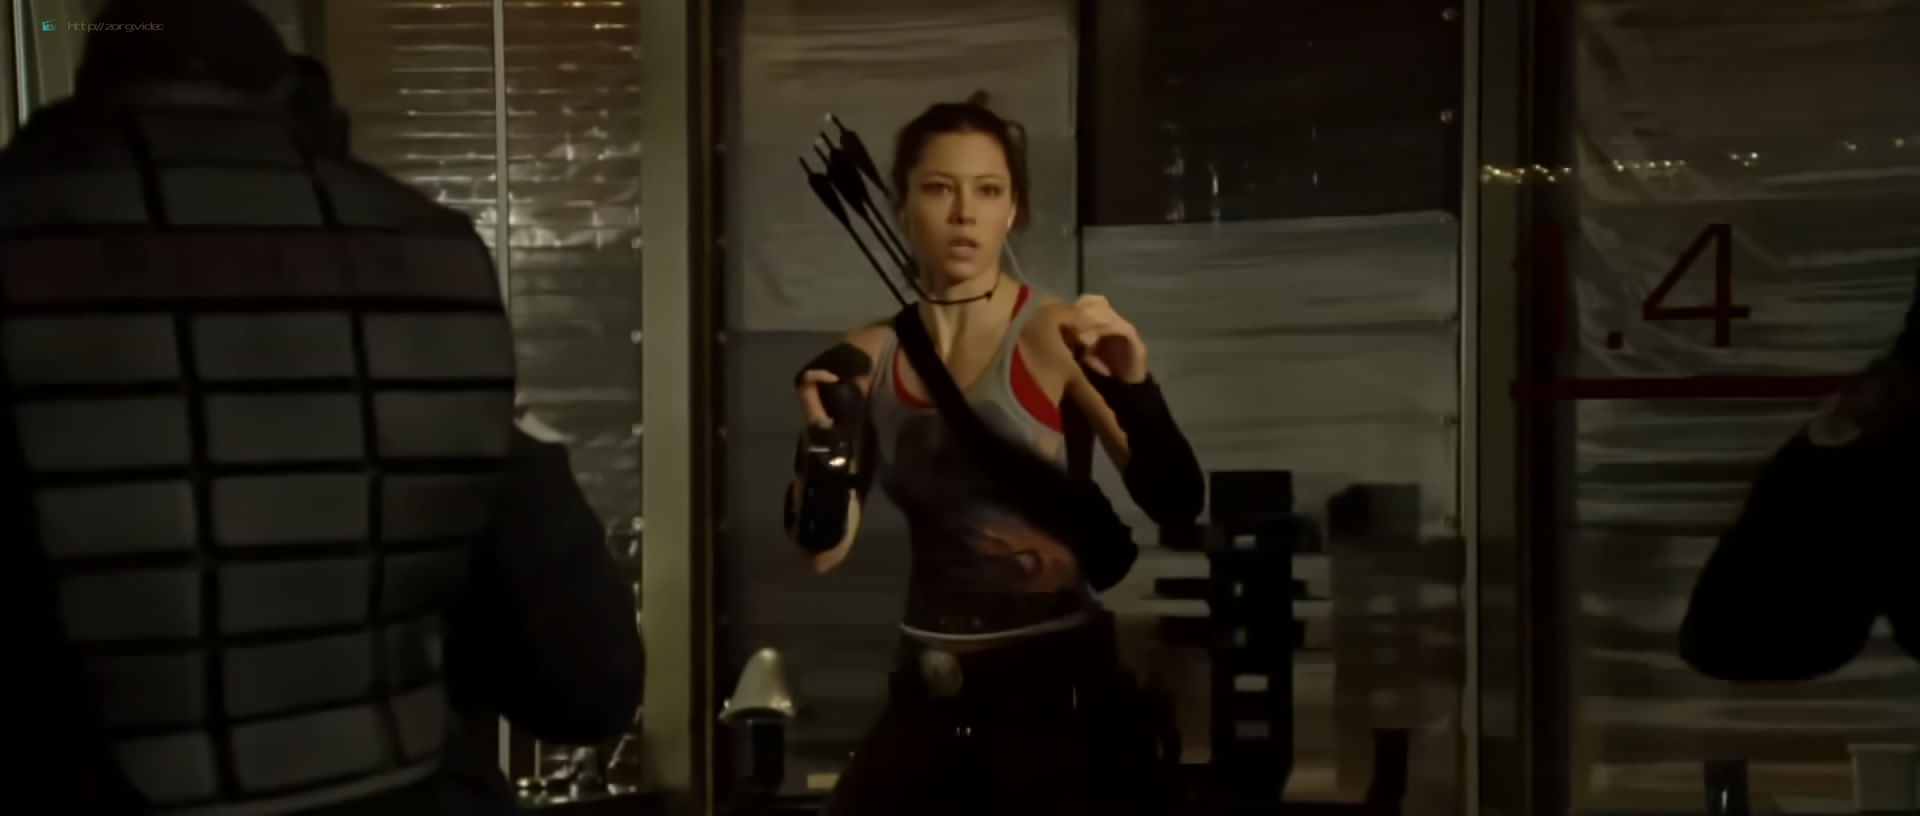 Jessica Biel hot and sexy - Blade Trinity (2004) HD 1080p BluRay (4)